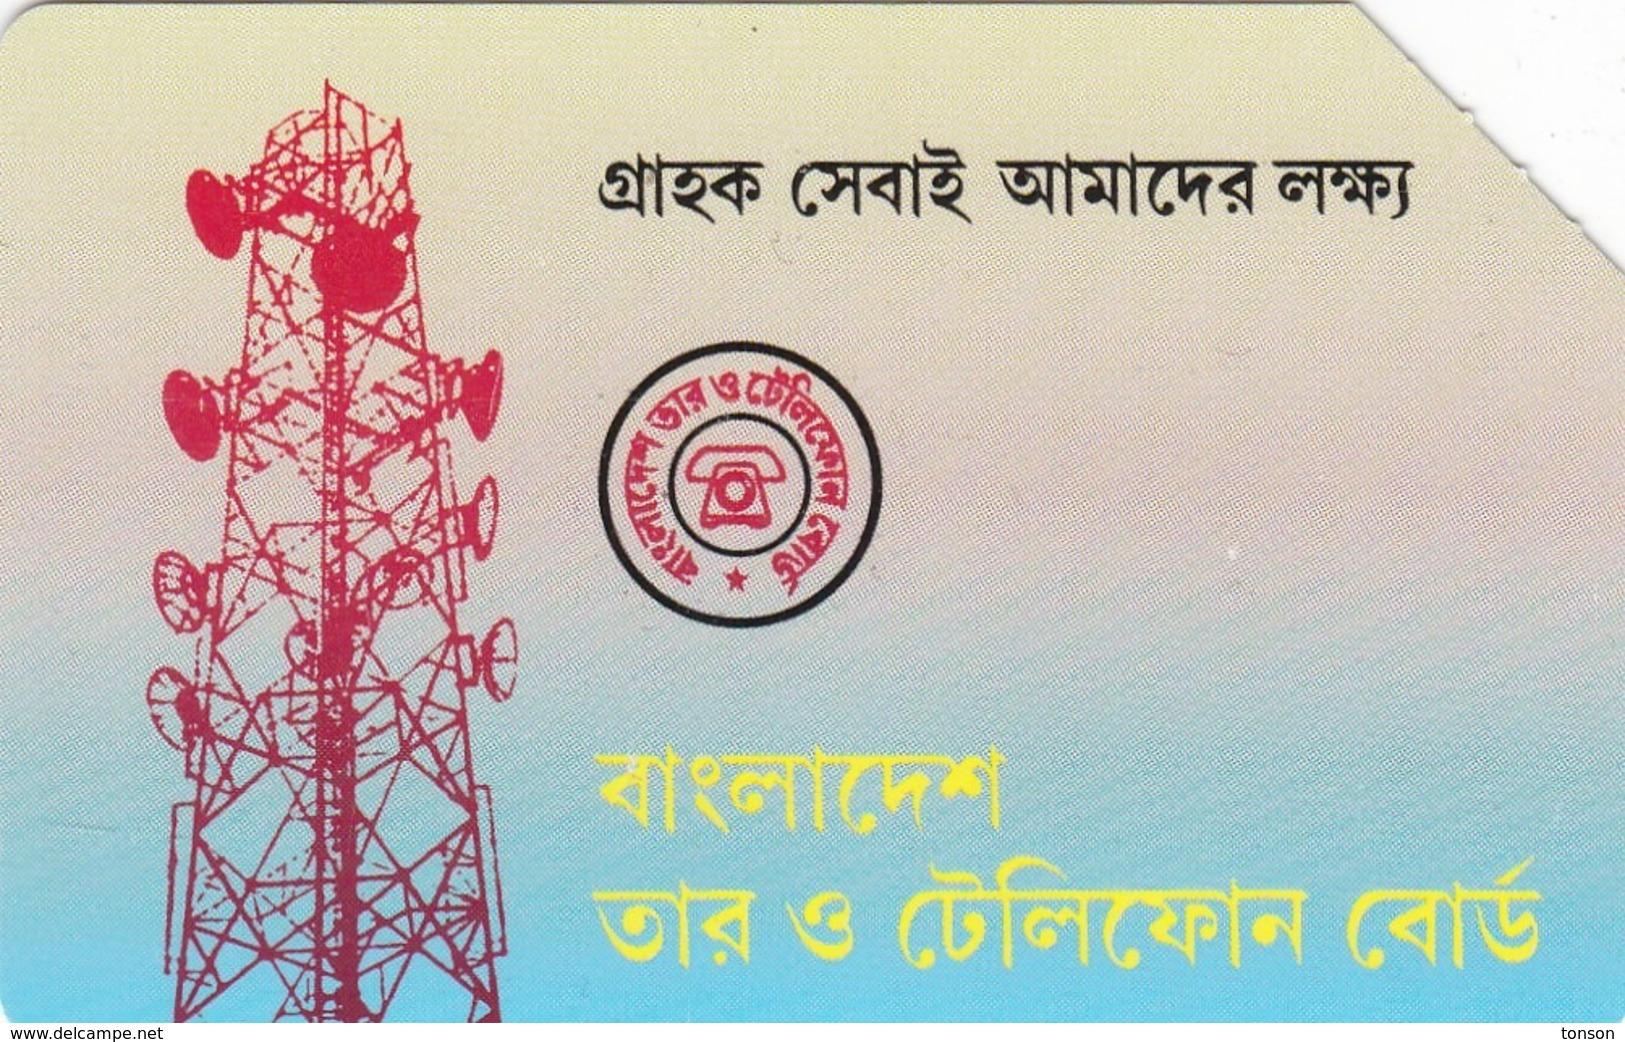 Bangladesh, BD-TSS-URM-0008C, 100 Units , Radio Station (Thin Band - Text On 3 Lines), 2 Scans. - Bangladesch